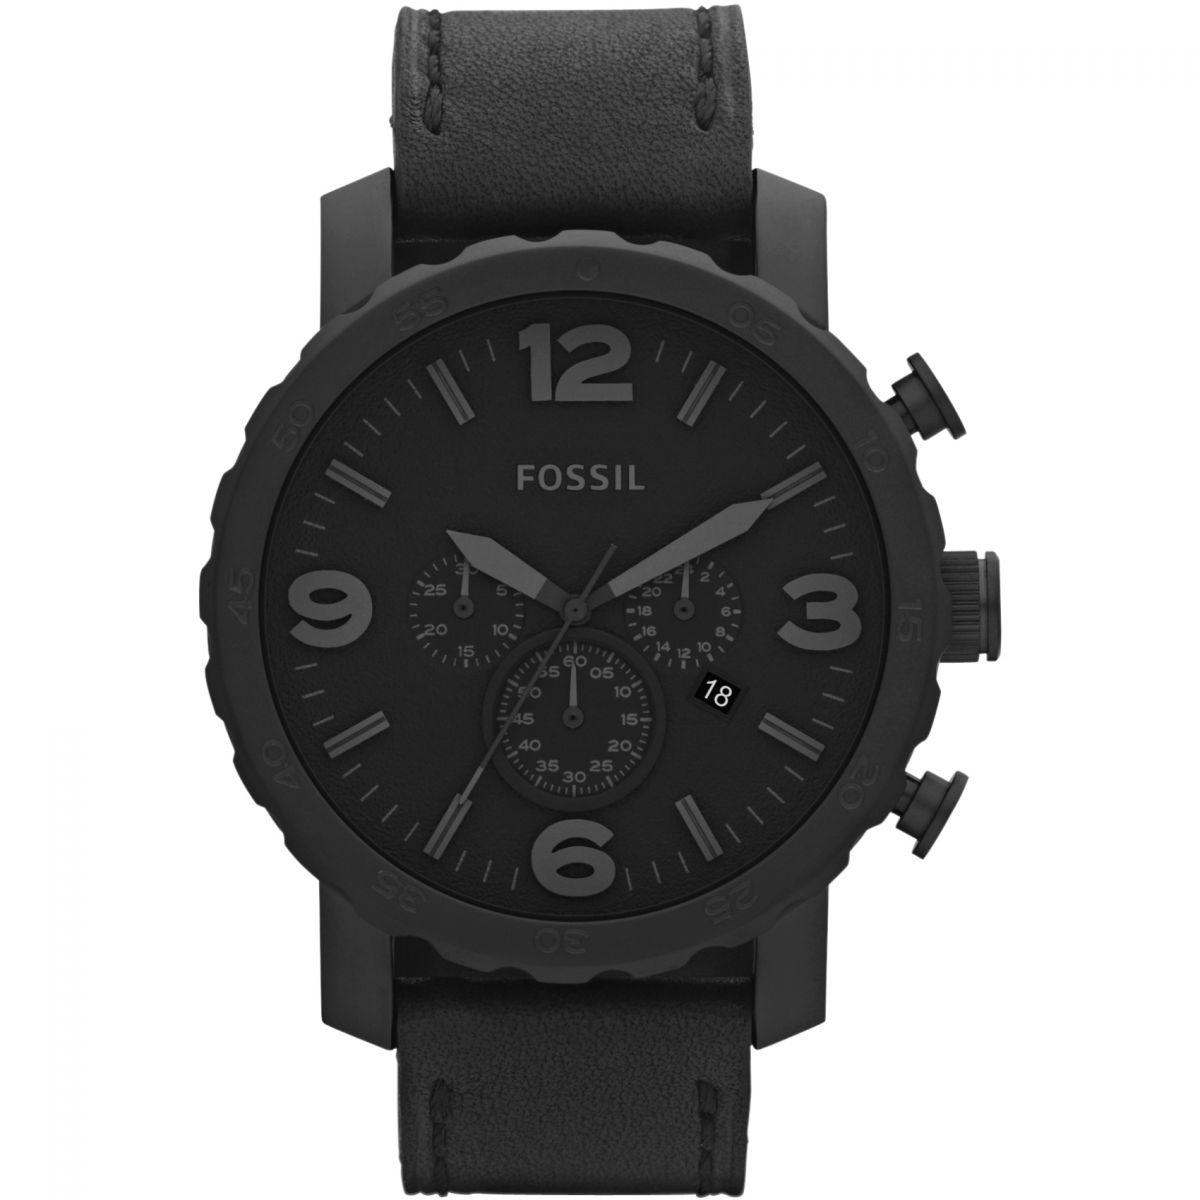 cadisen Mechanical Watch Men's Skeleton wristwatch Man watches Leather Relogio Masculino Luxury